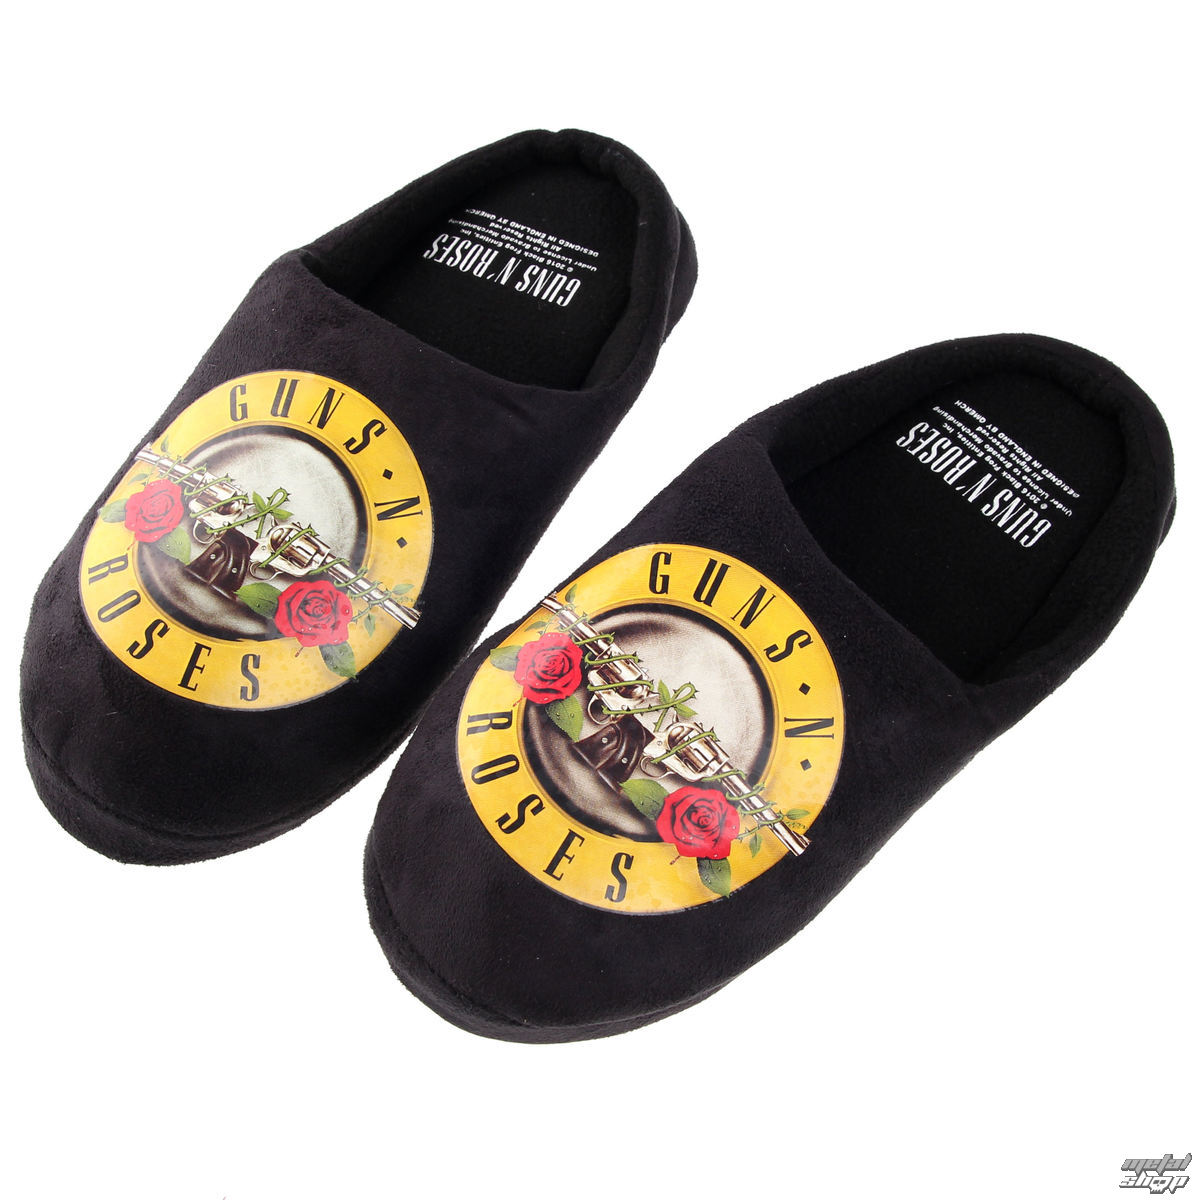 papuče Guns N' Roses - RCK002